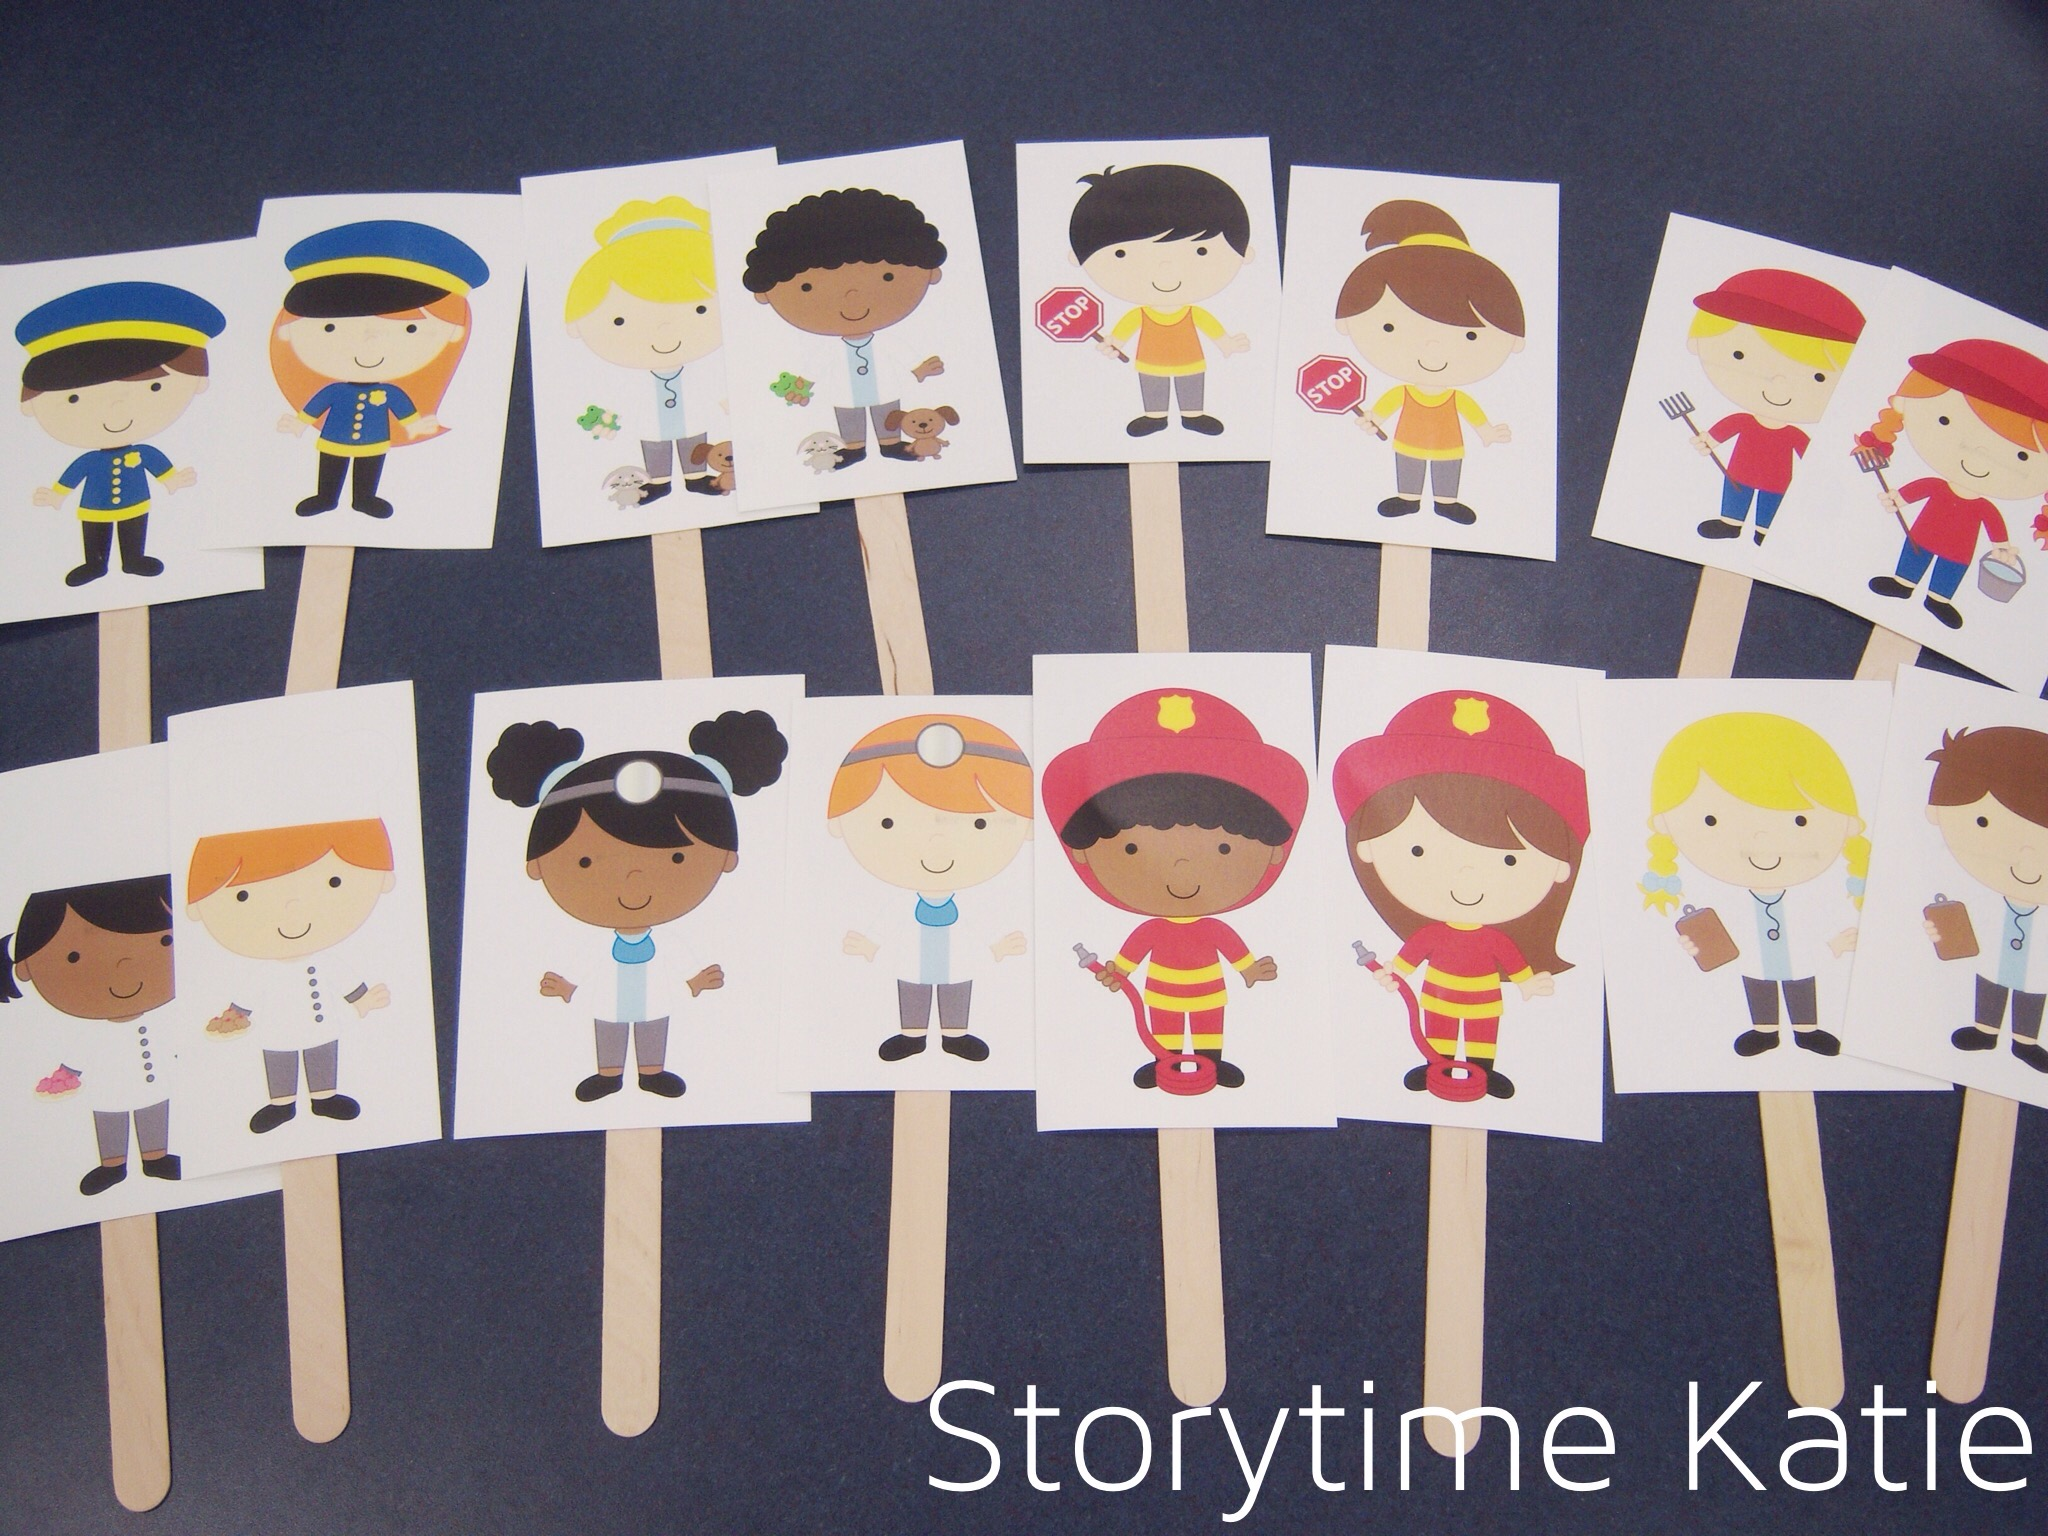 Flannelboard Storytime Katie